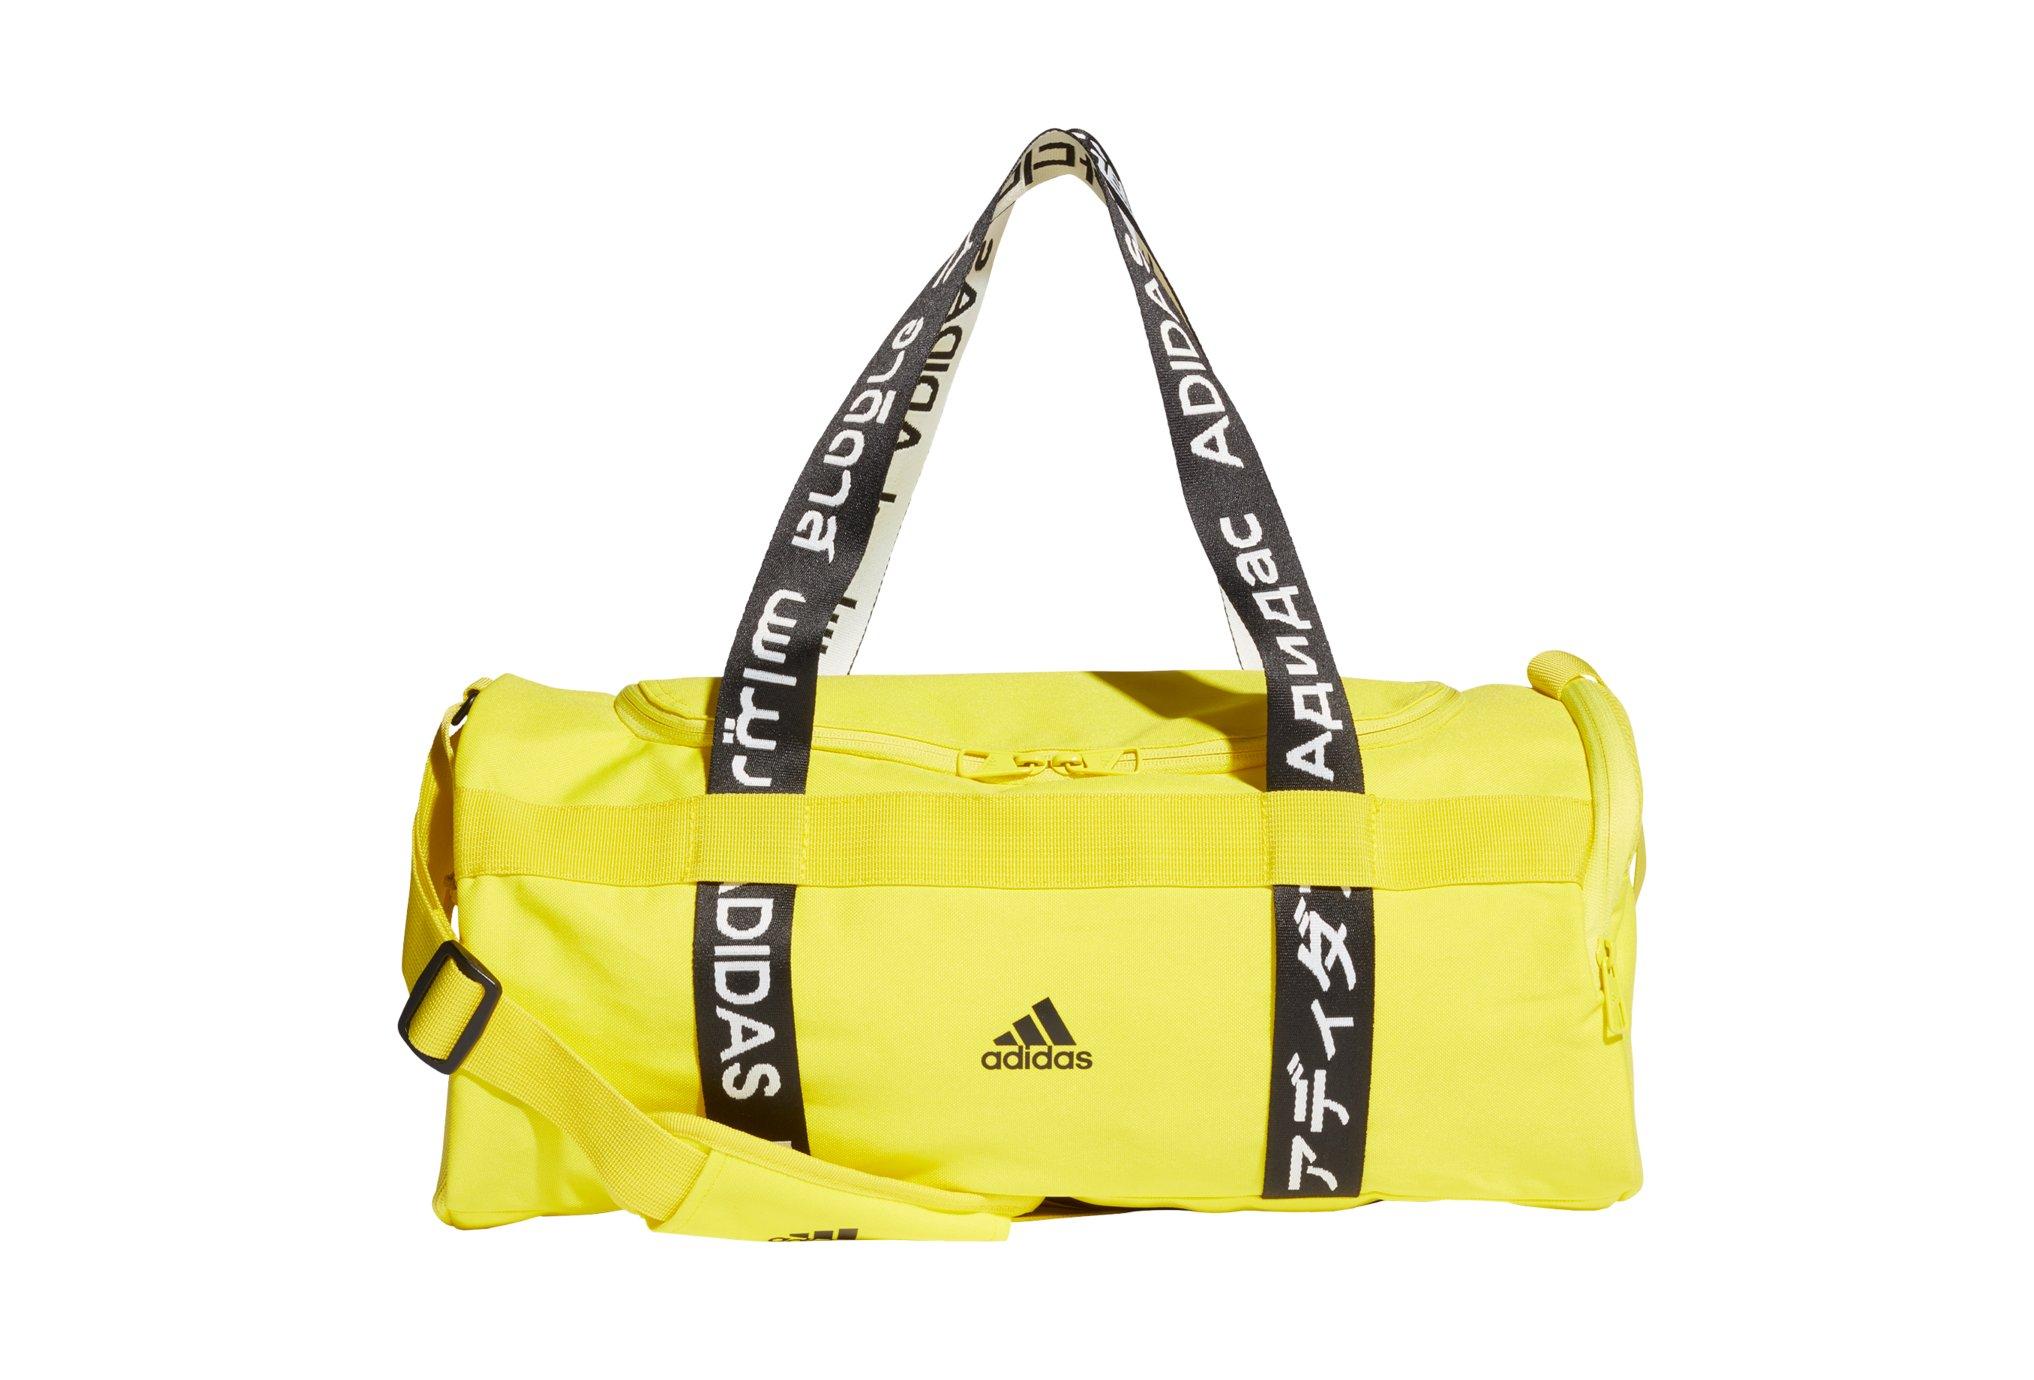 Adidas 4 athletes- s sac de sport